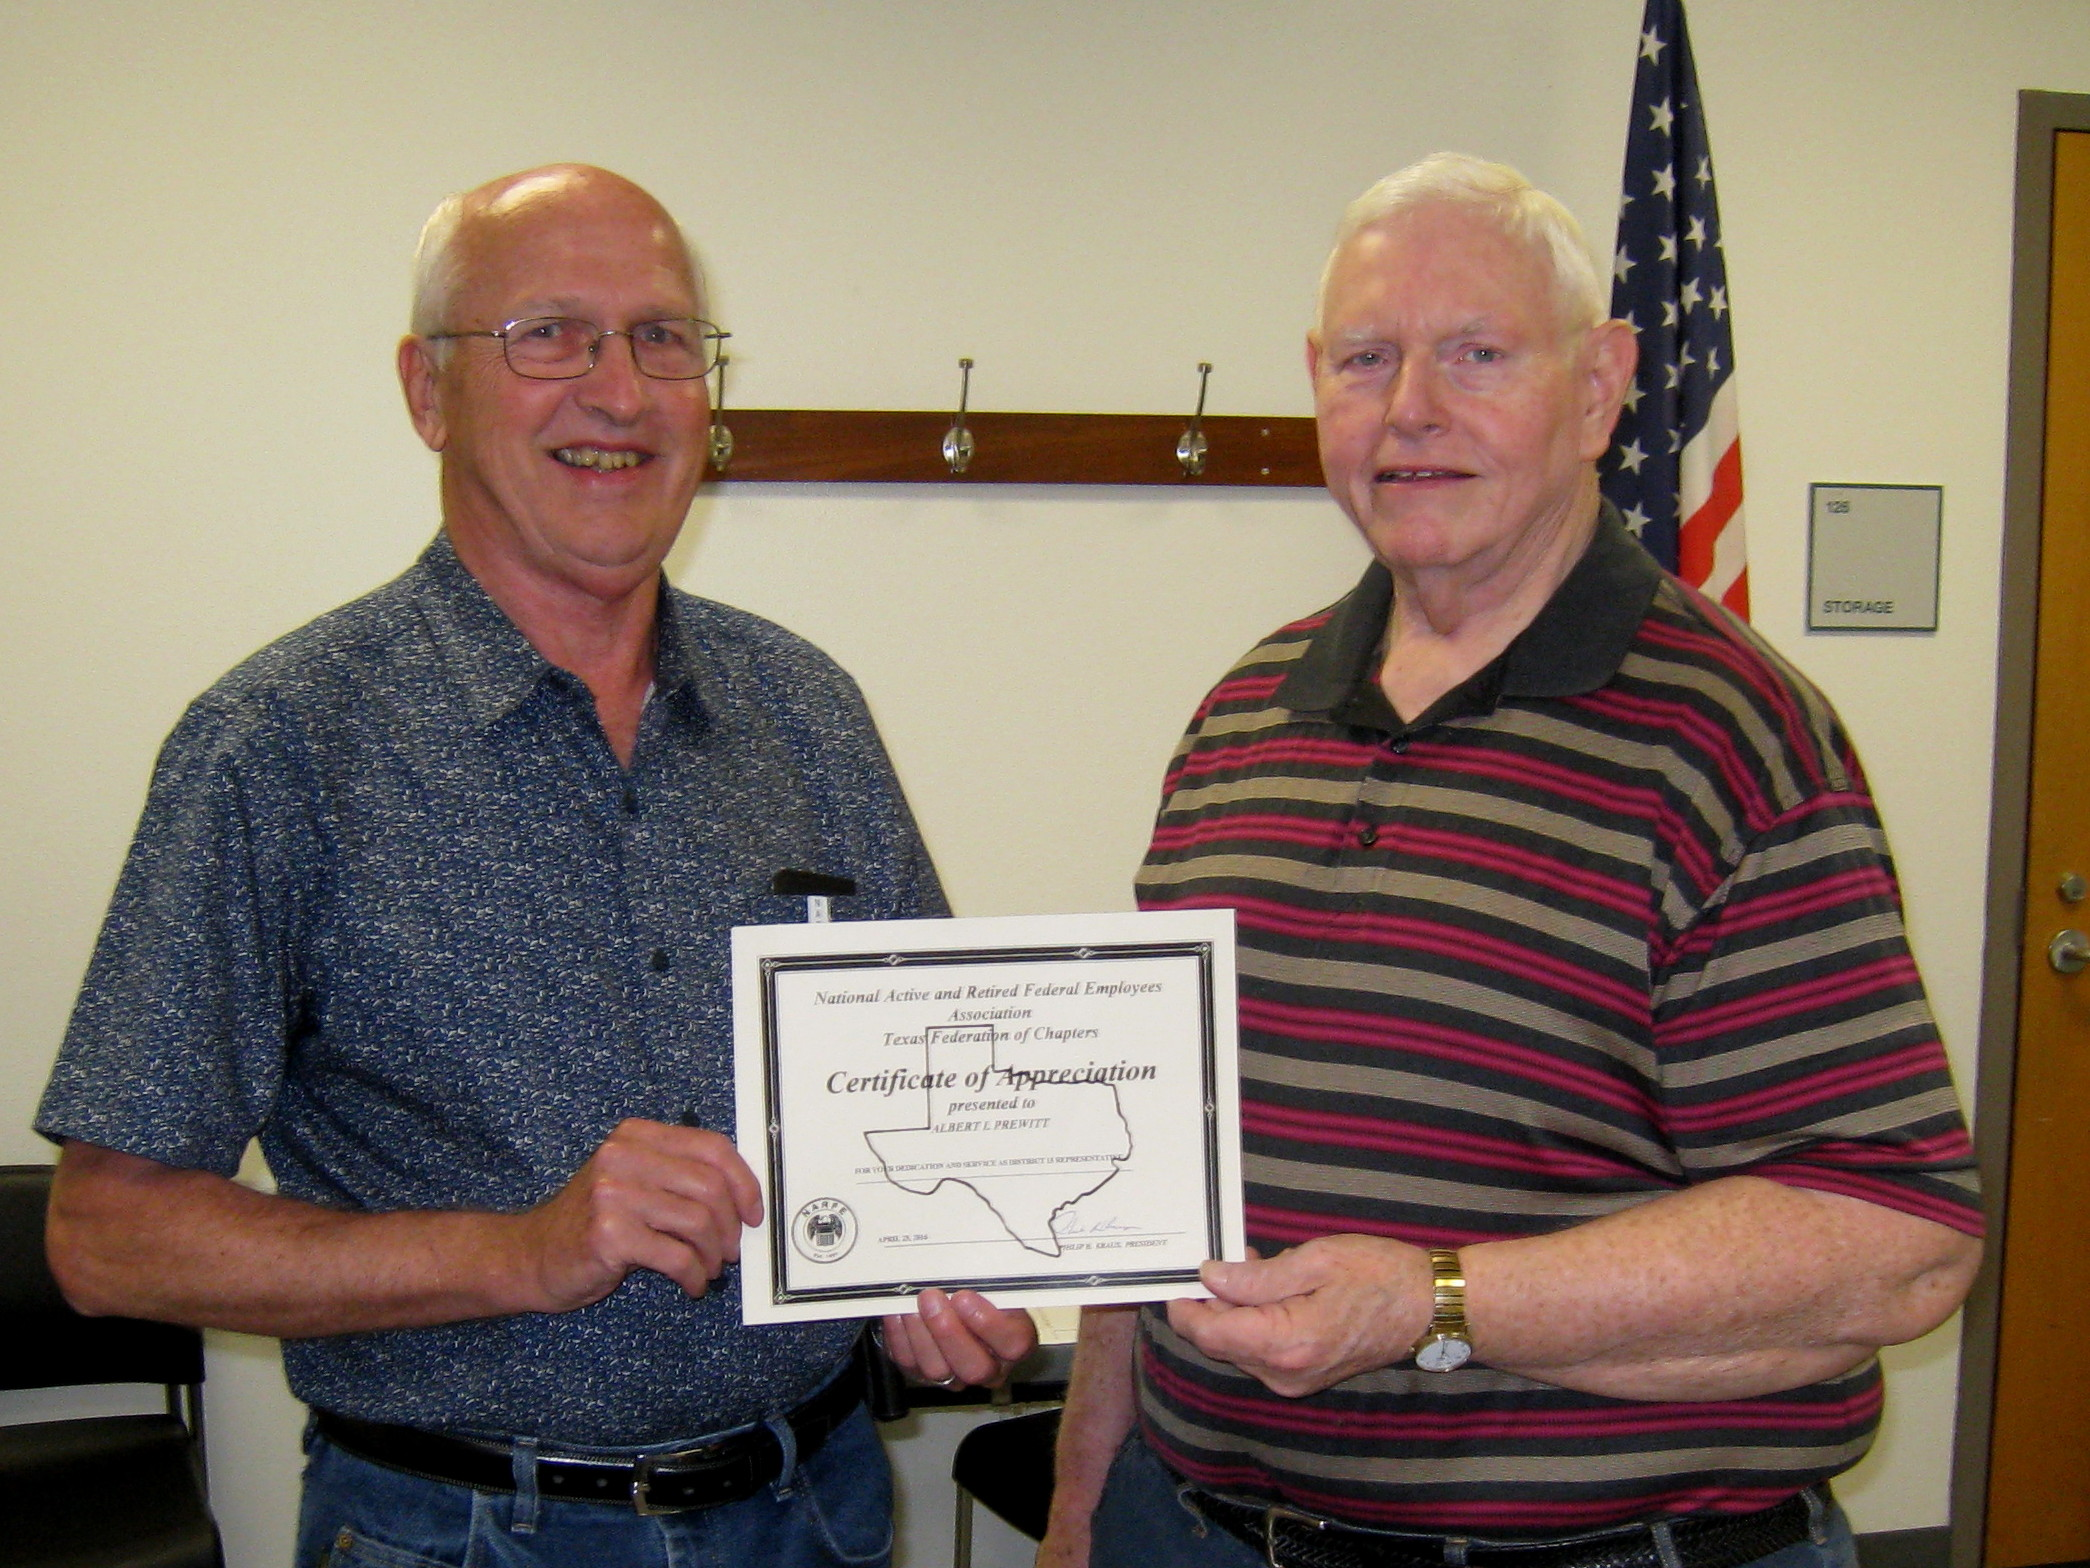 Jim Ploen presenting award to Al Prewitt